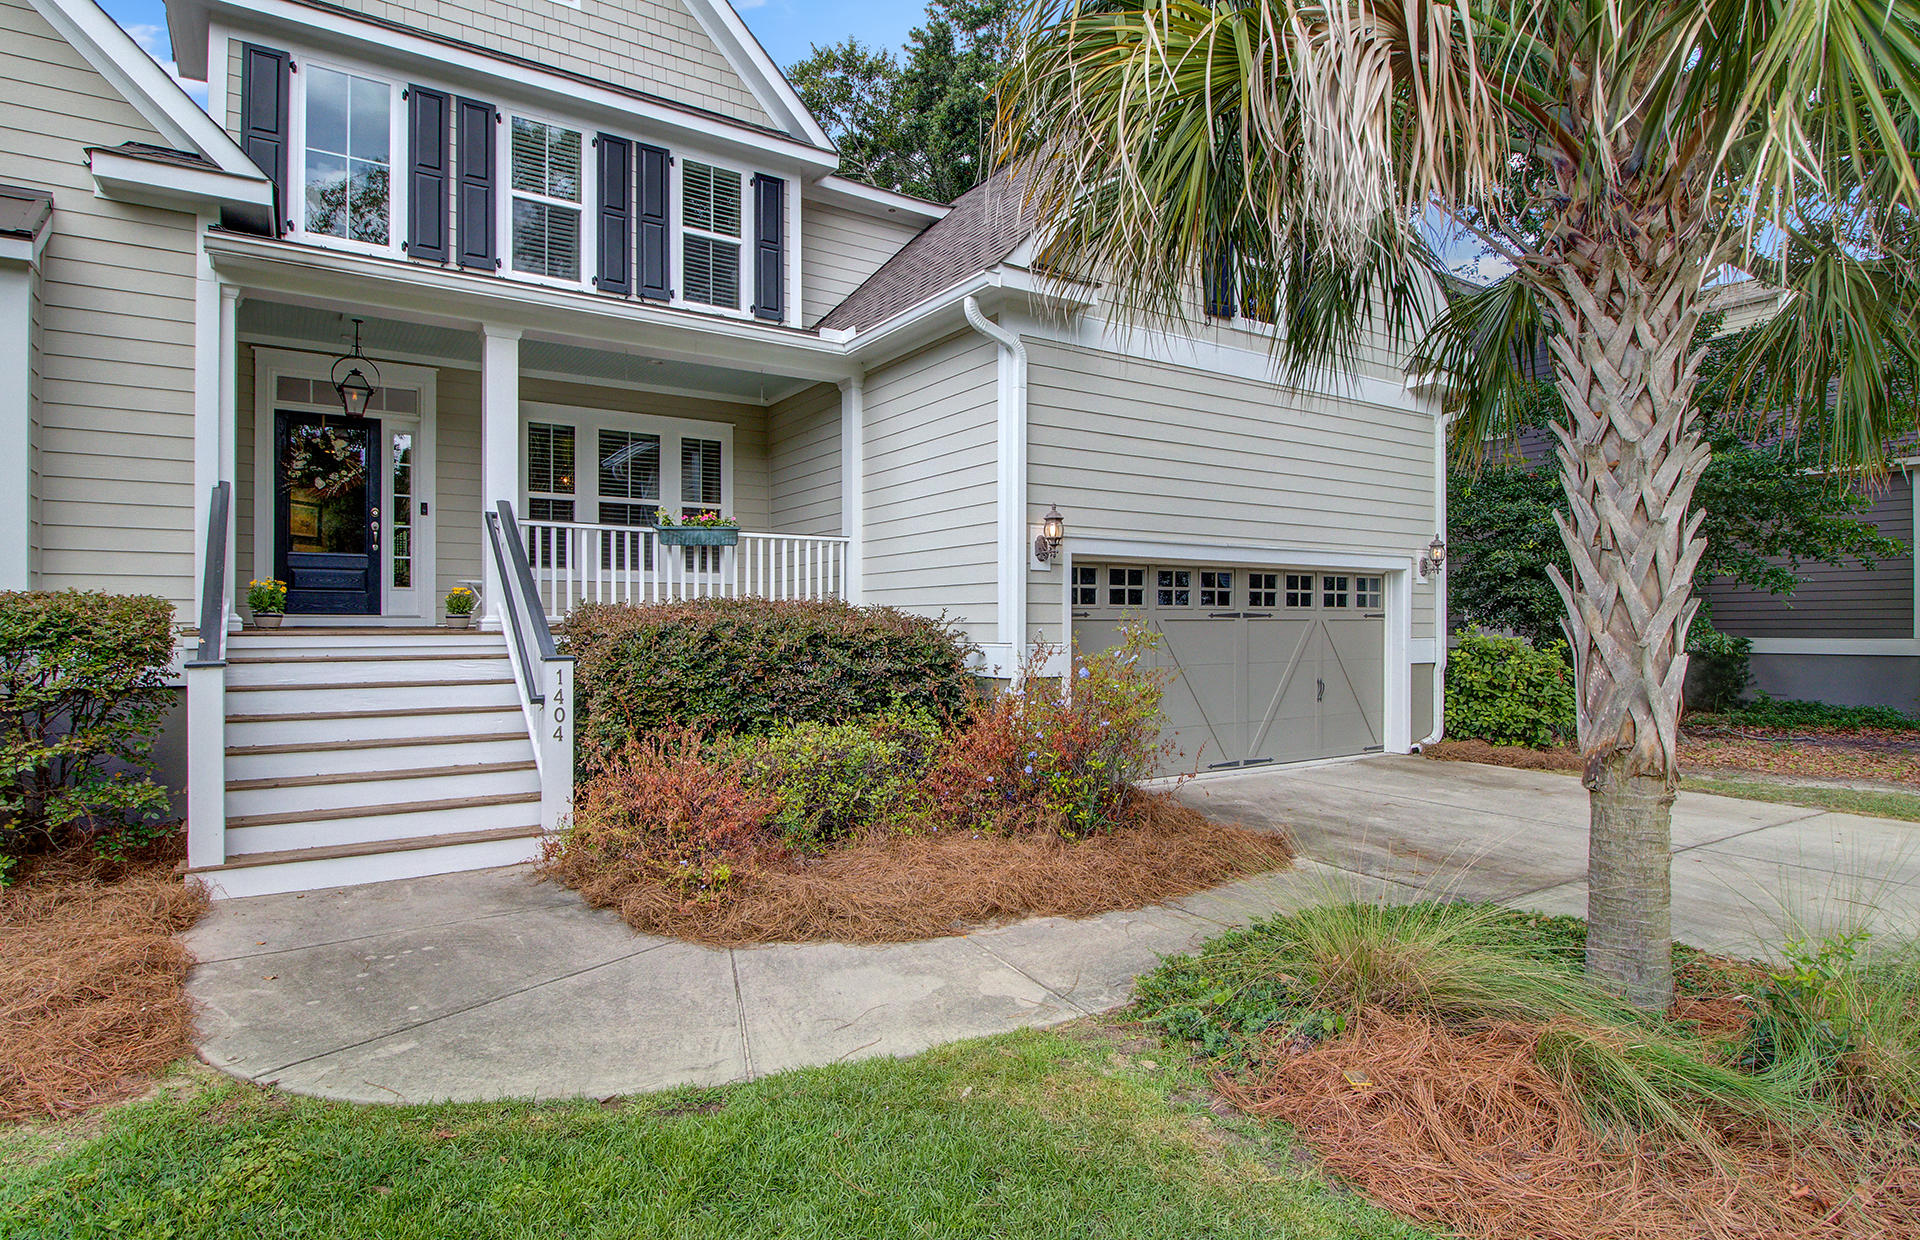 Scotts Creek Homes For Sale - 1404 Scotts Creek, Mount Pleasant, SC - 50